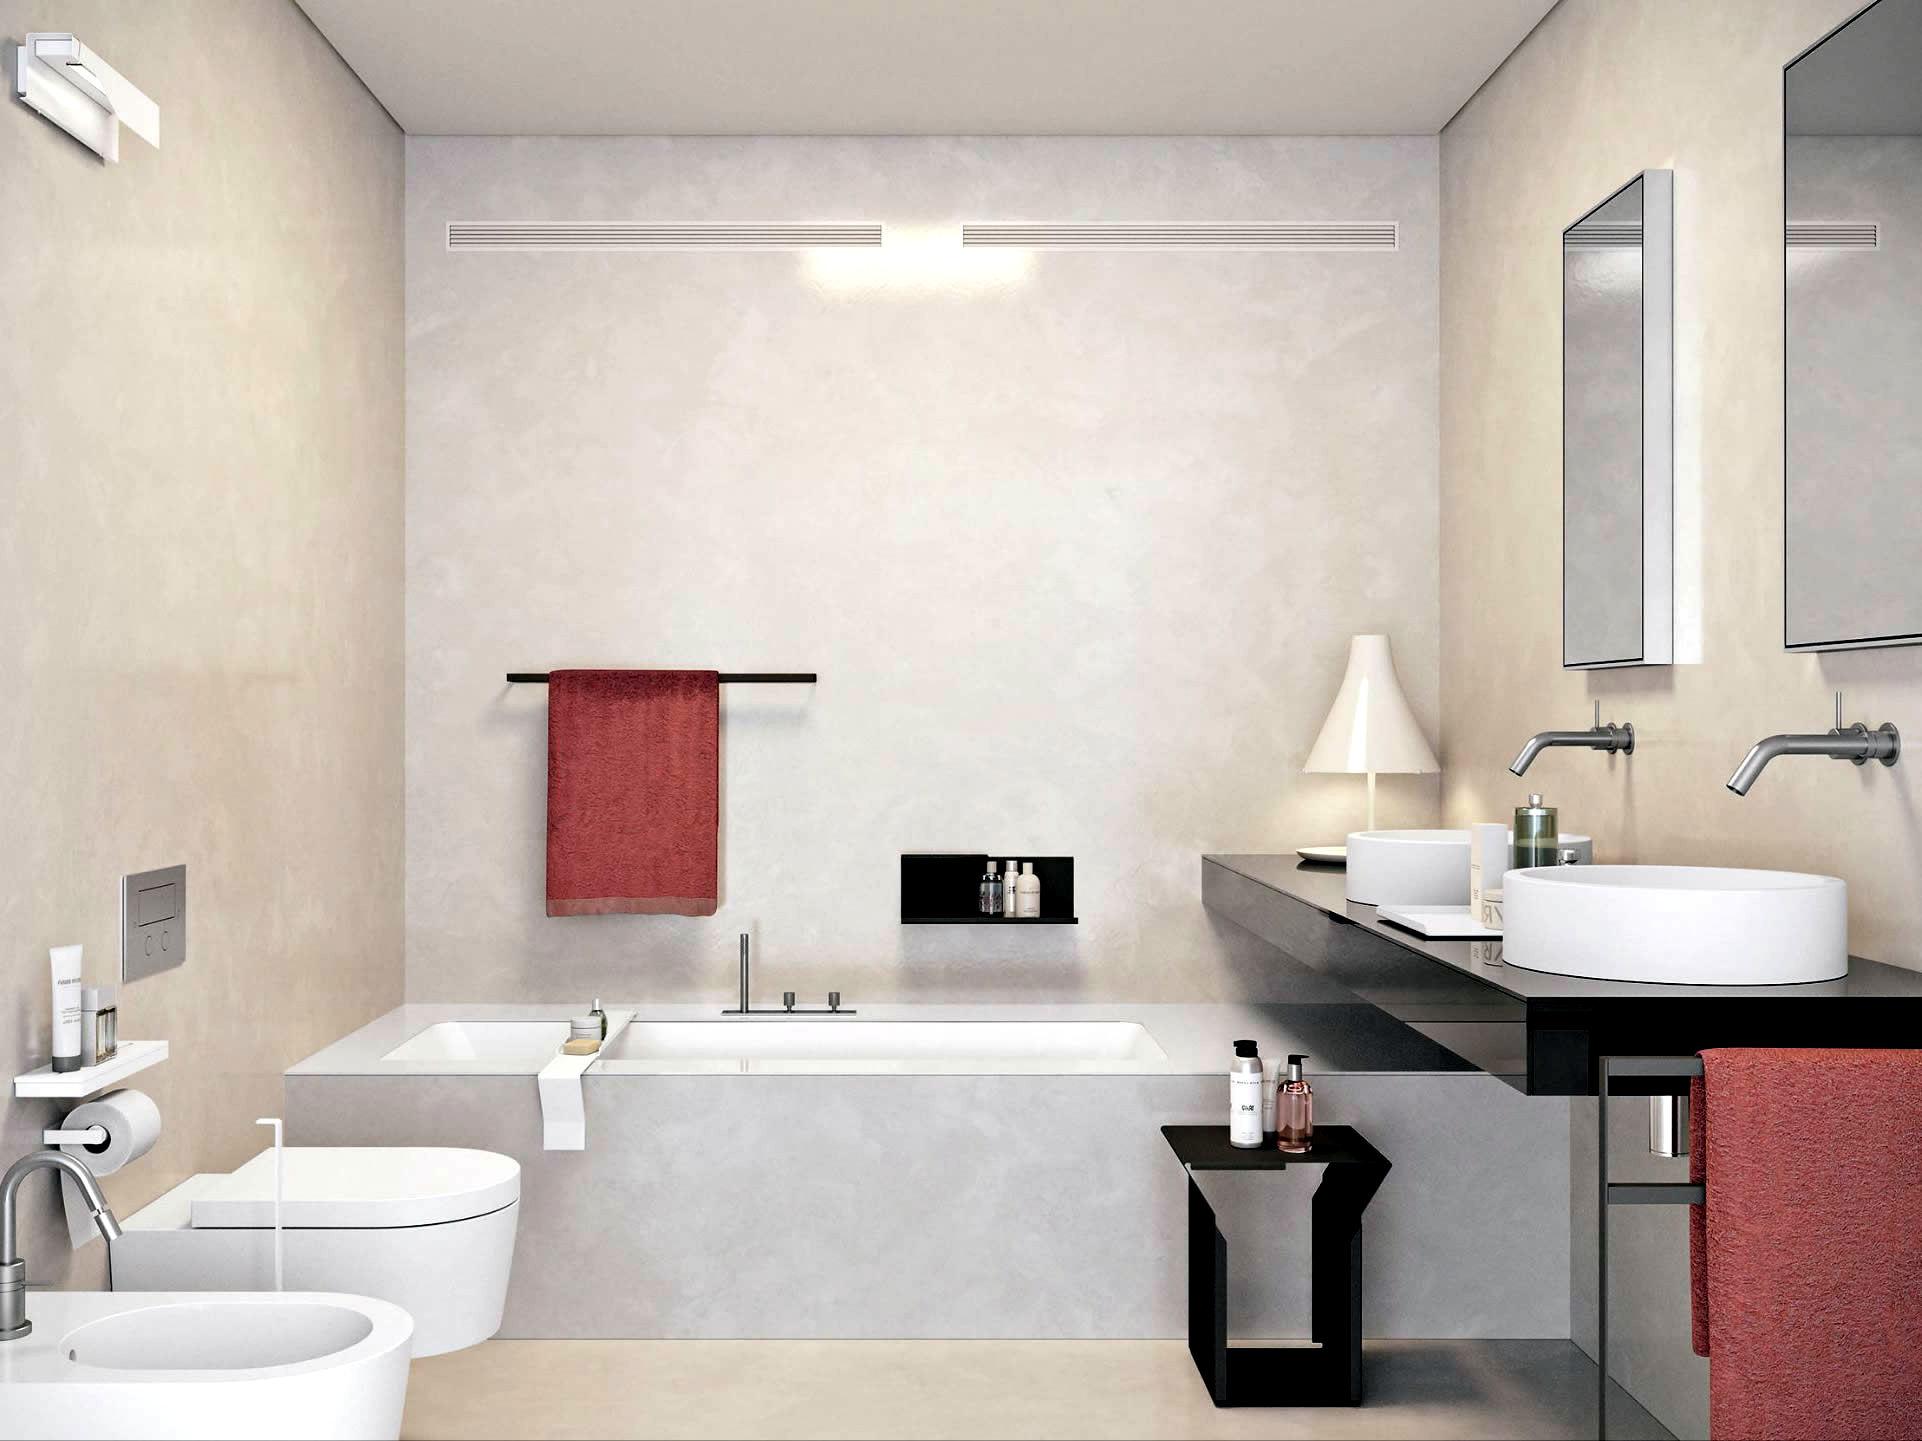 Modern Built In Bath Tub With Space Saving Design Interior